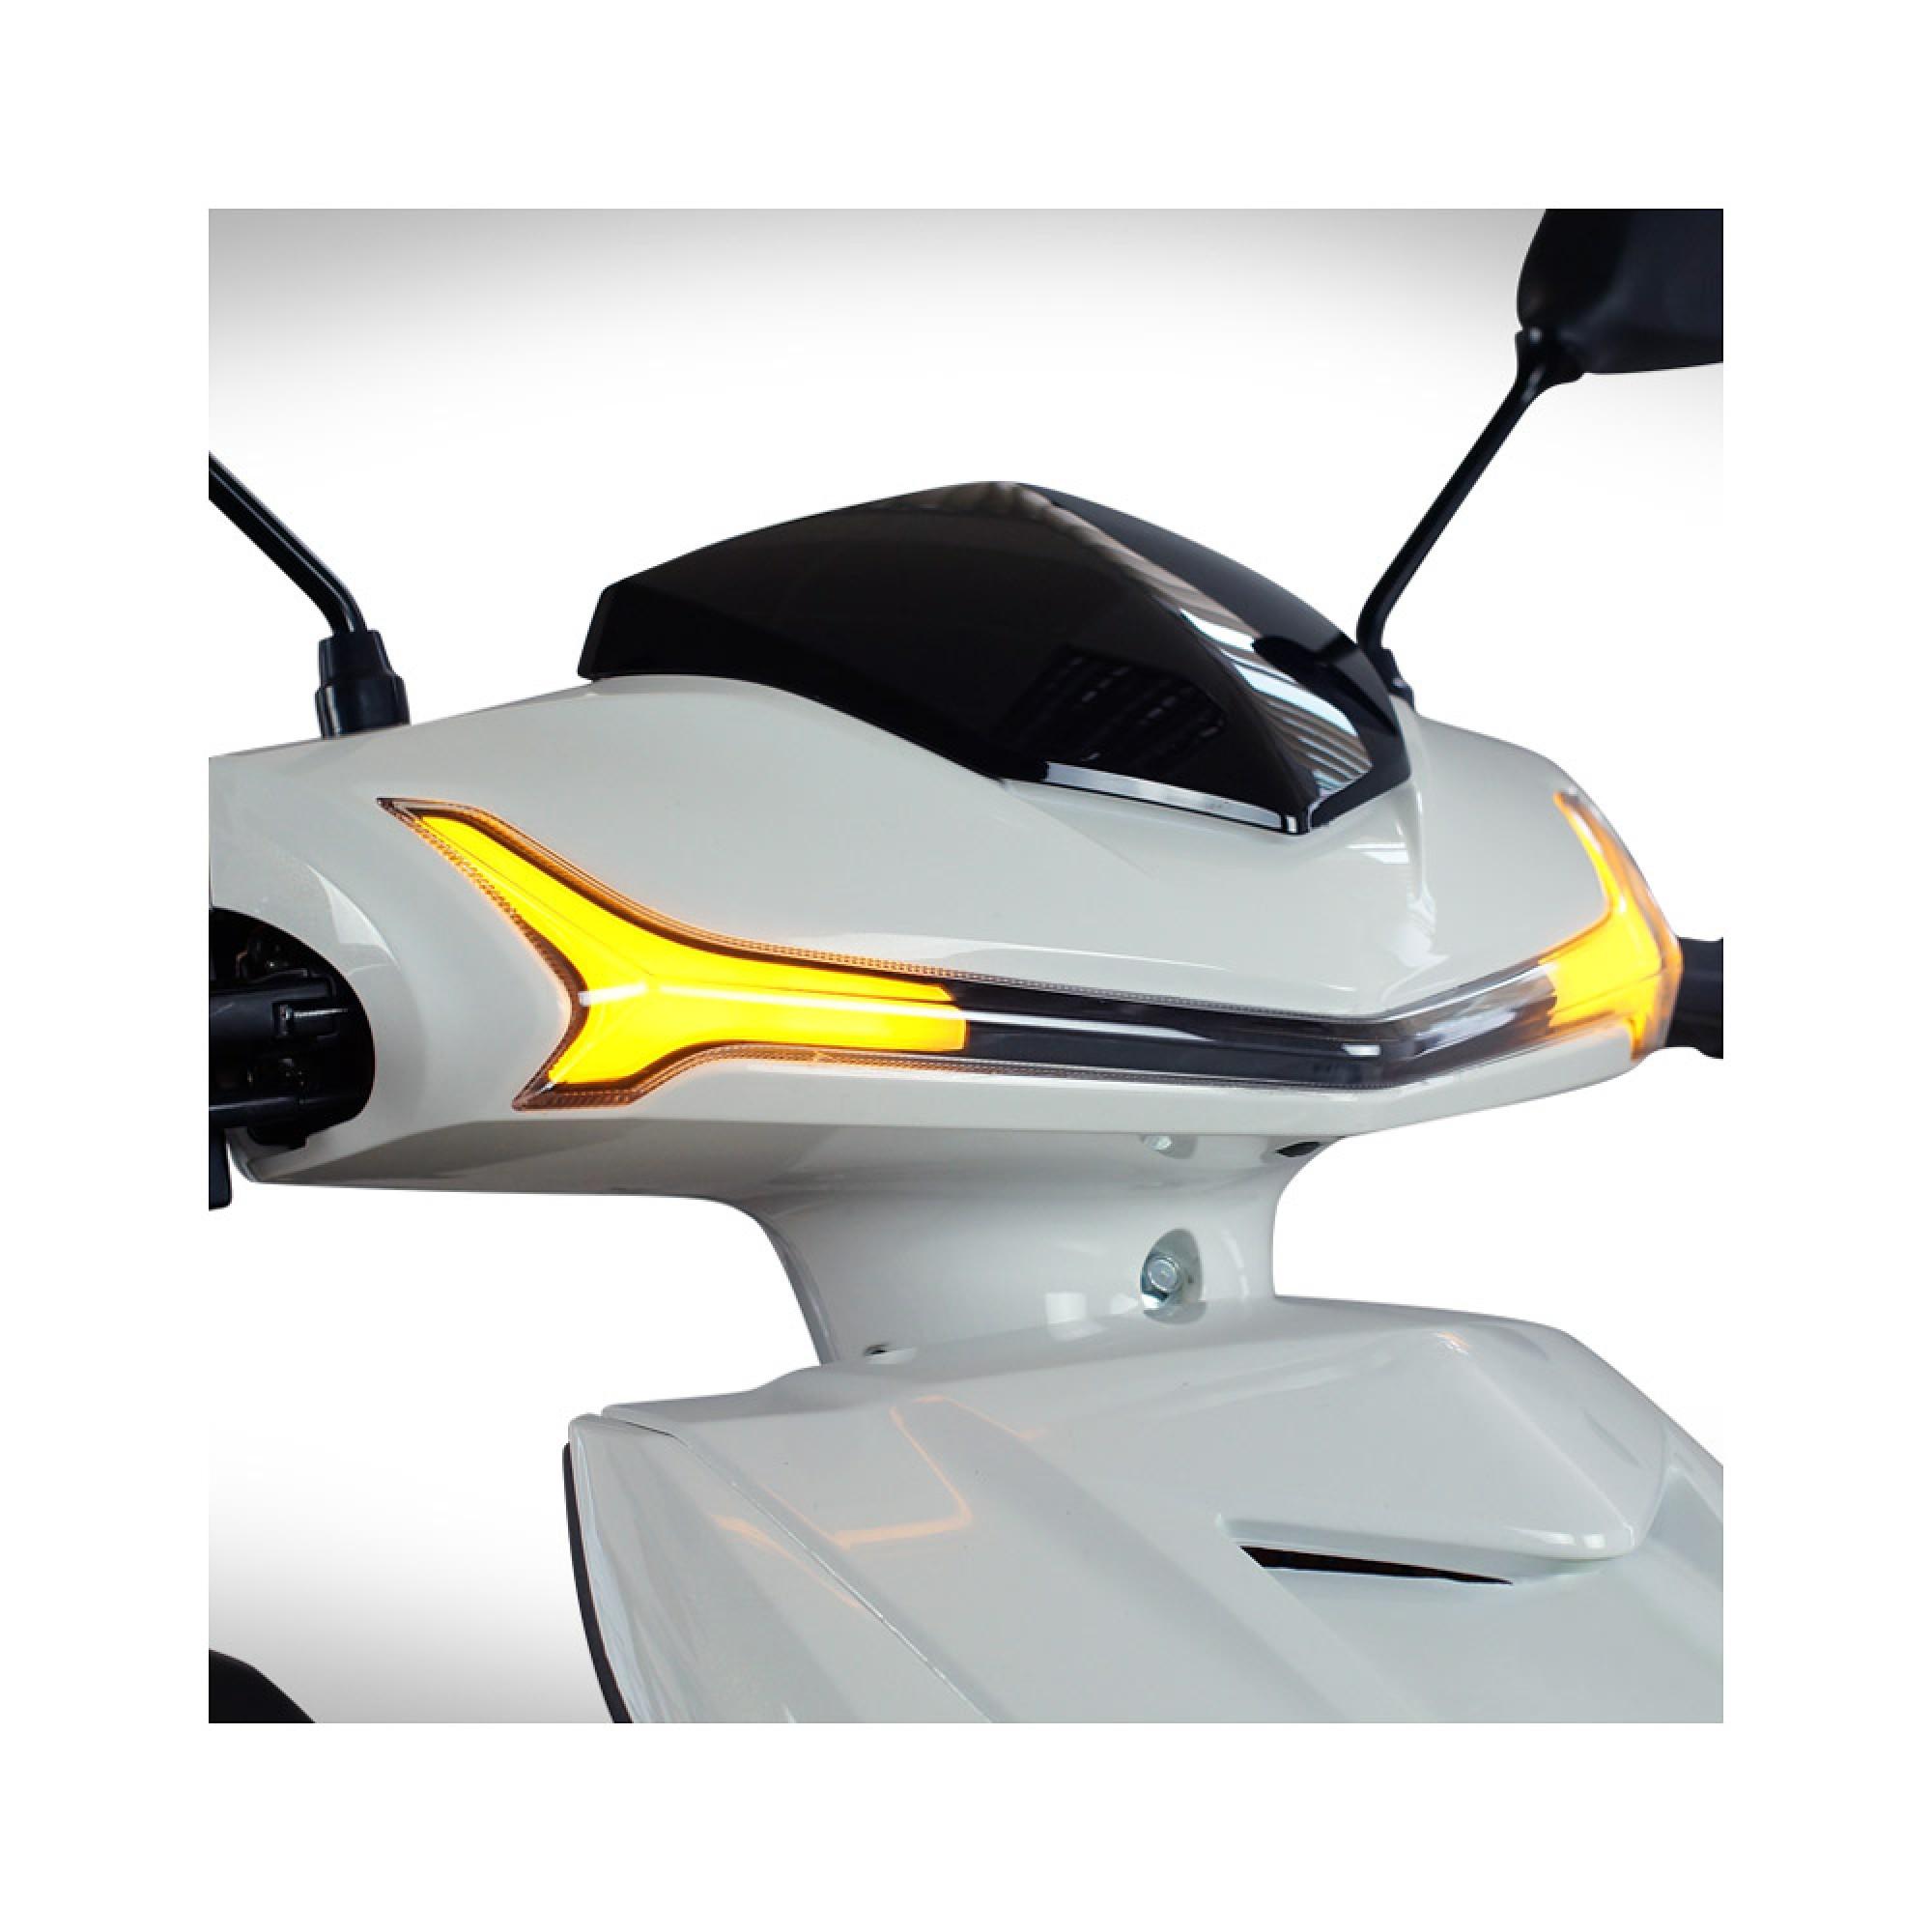 Eco Rider MX Pro RKS